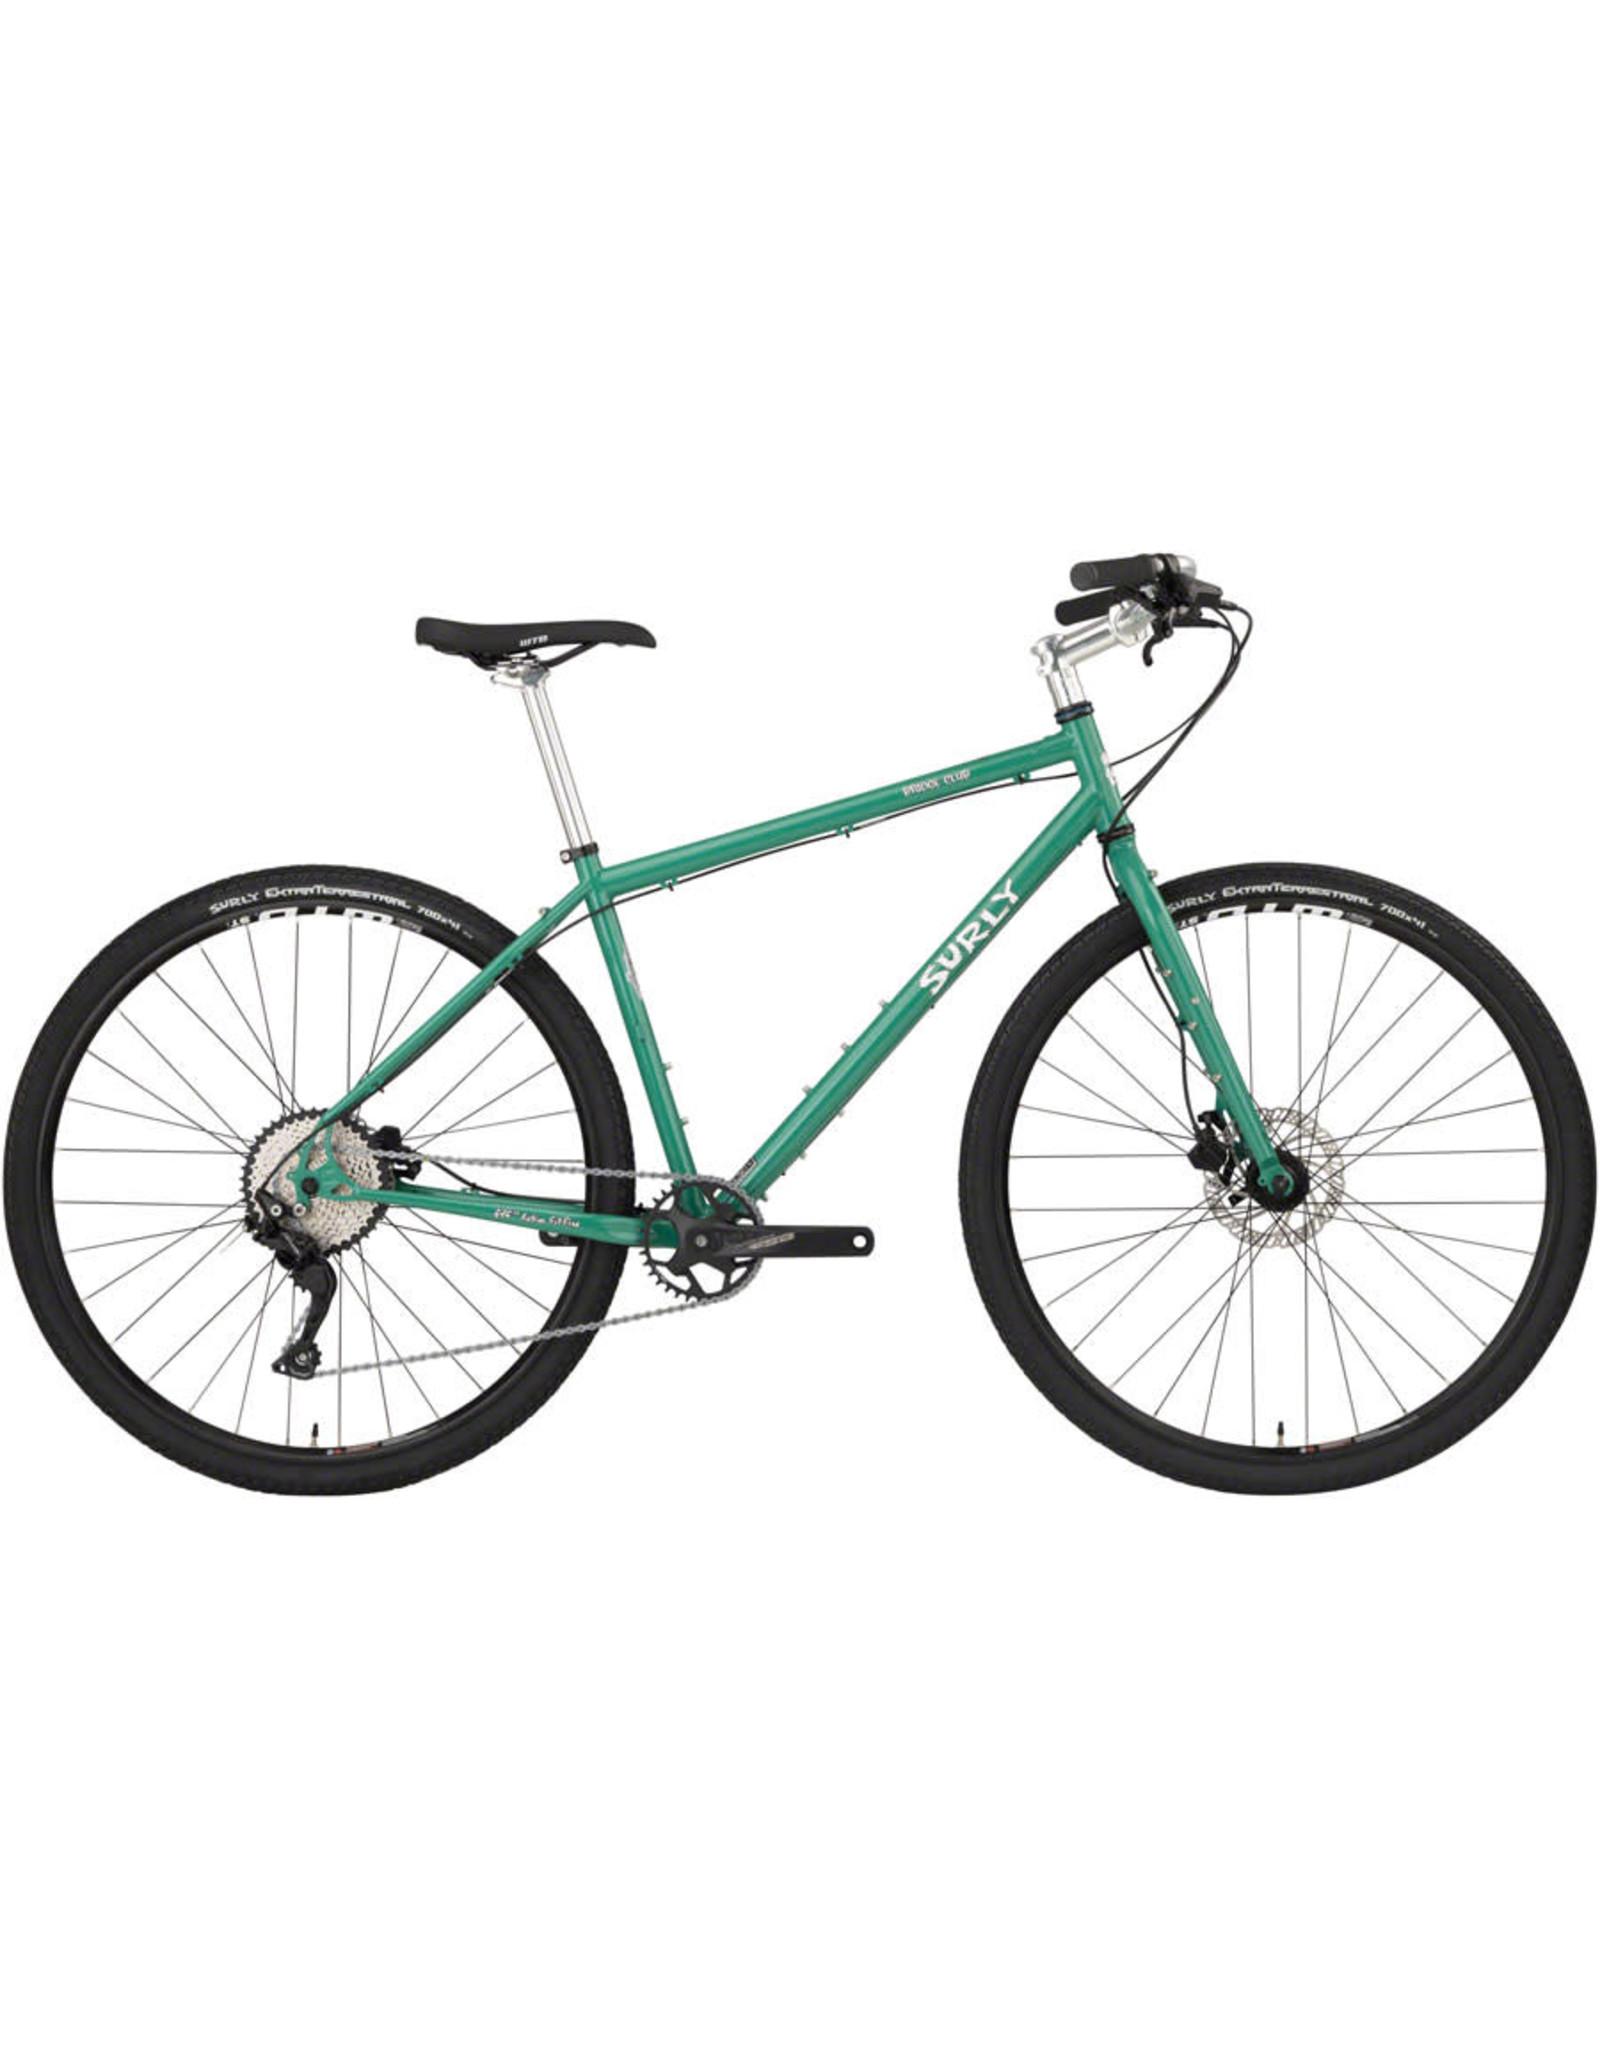 Surly Surly Bridge Club 700c Bike - Steel, Illegal Smile